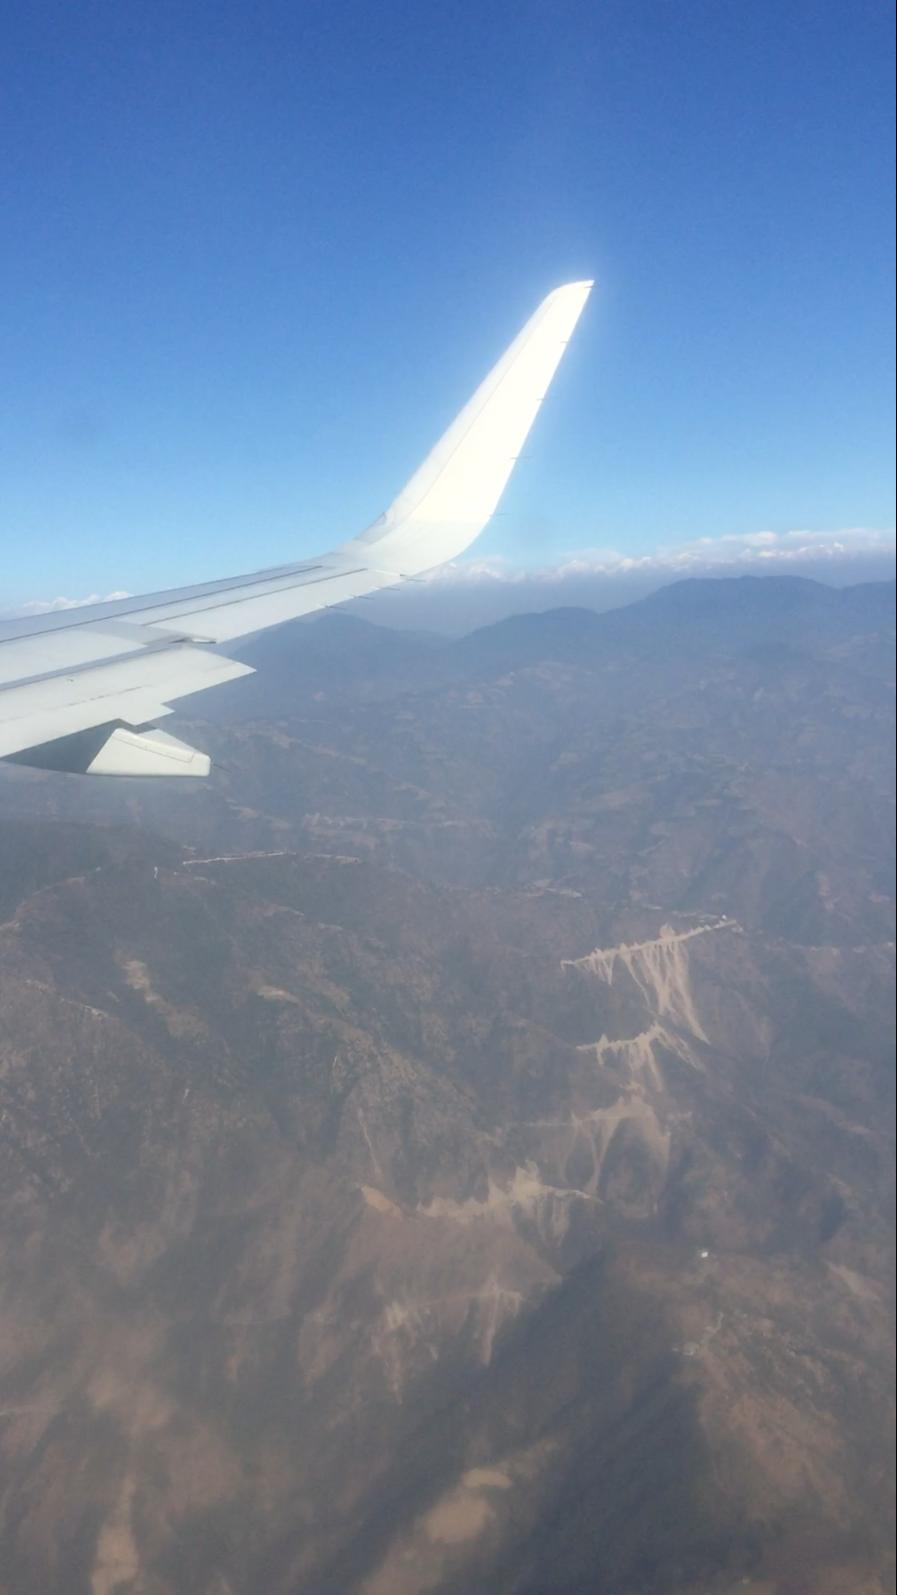 Those Himalayas though